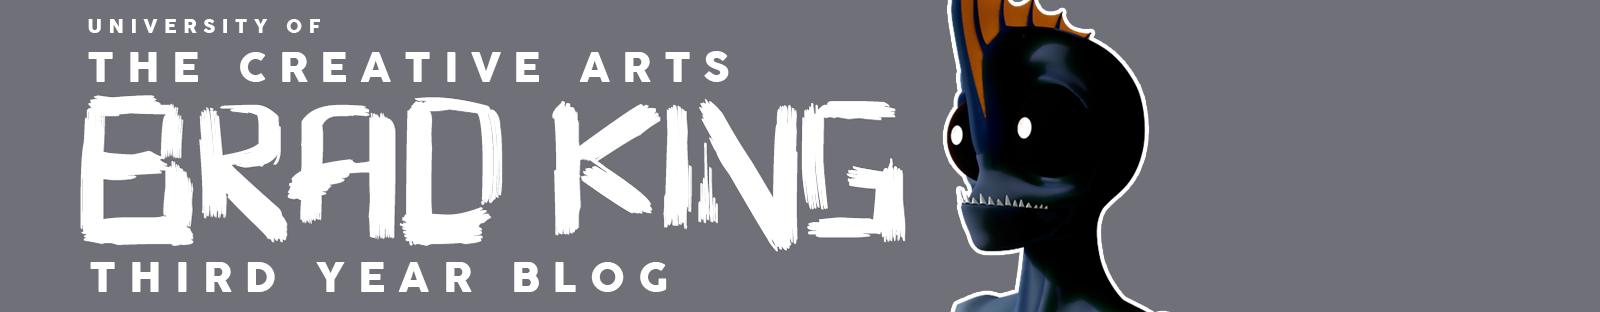 Brad King's Blog